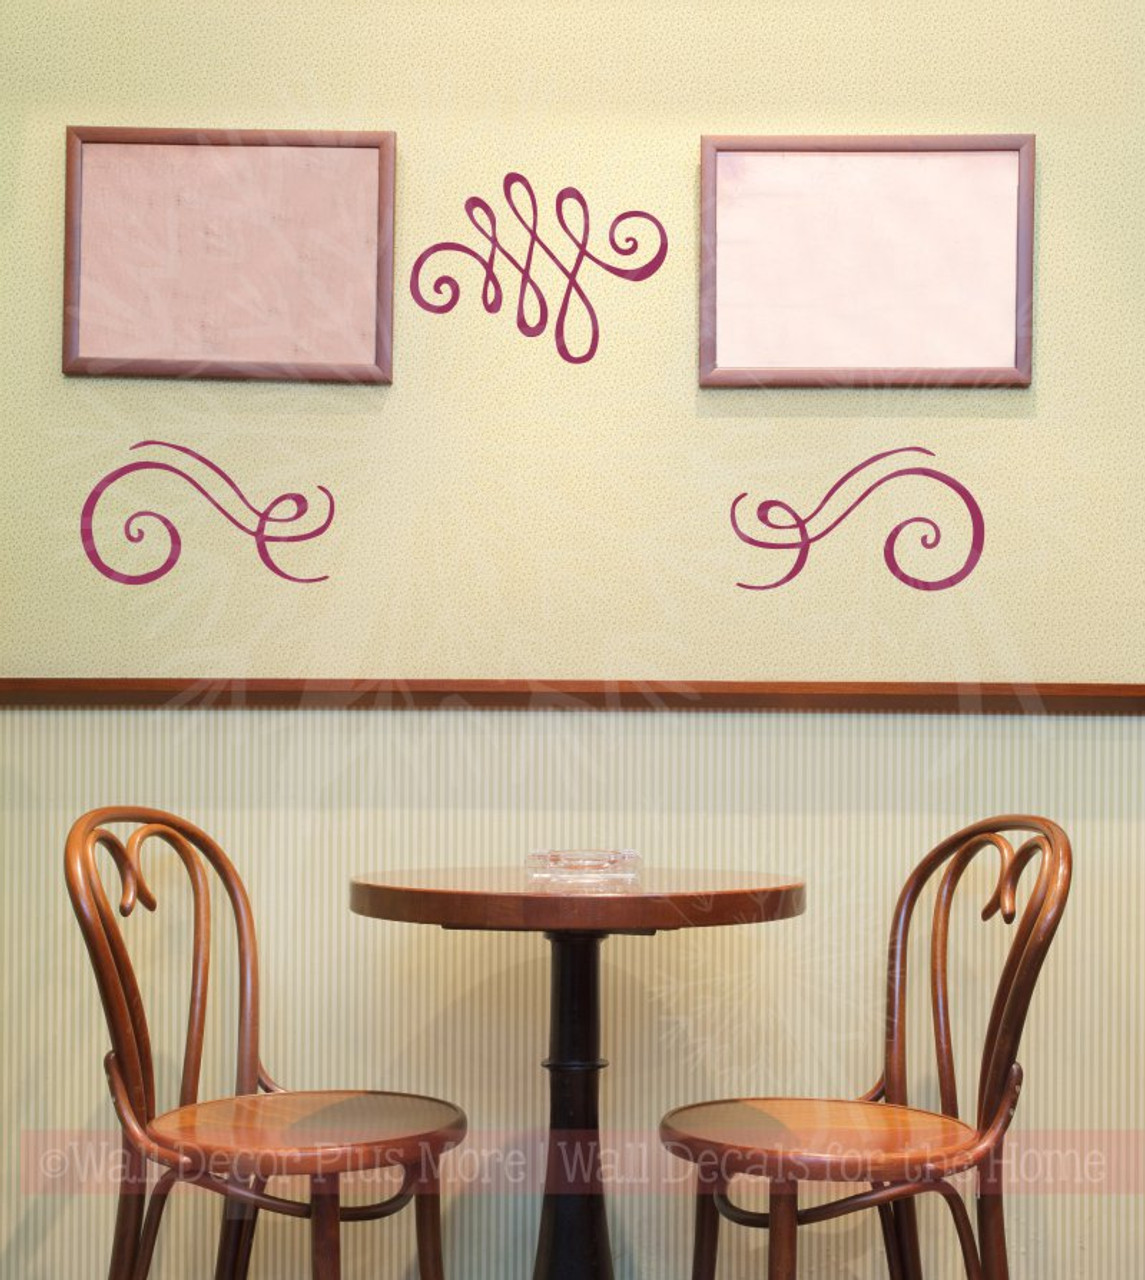 Swirls Wall Art Stickers Vinyl Decals Living Room Home Wall Décor 3pc